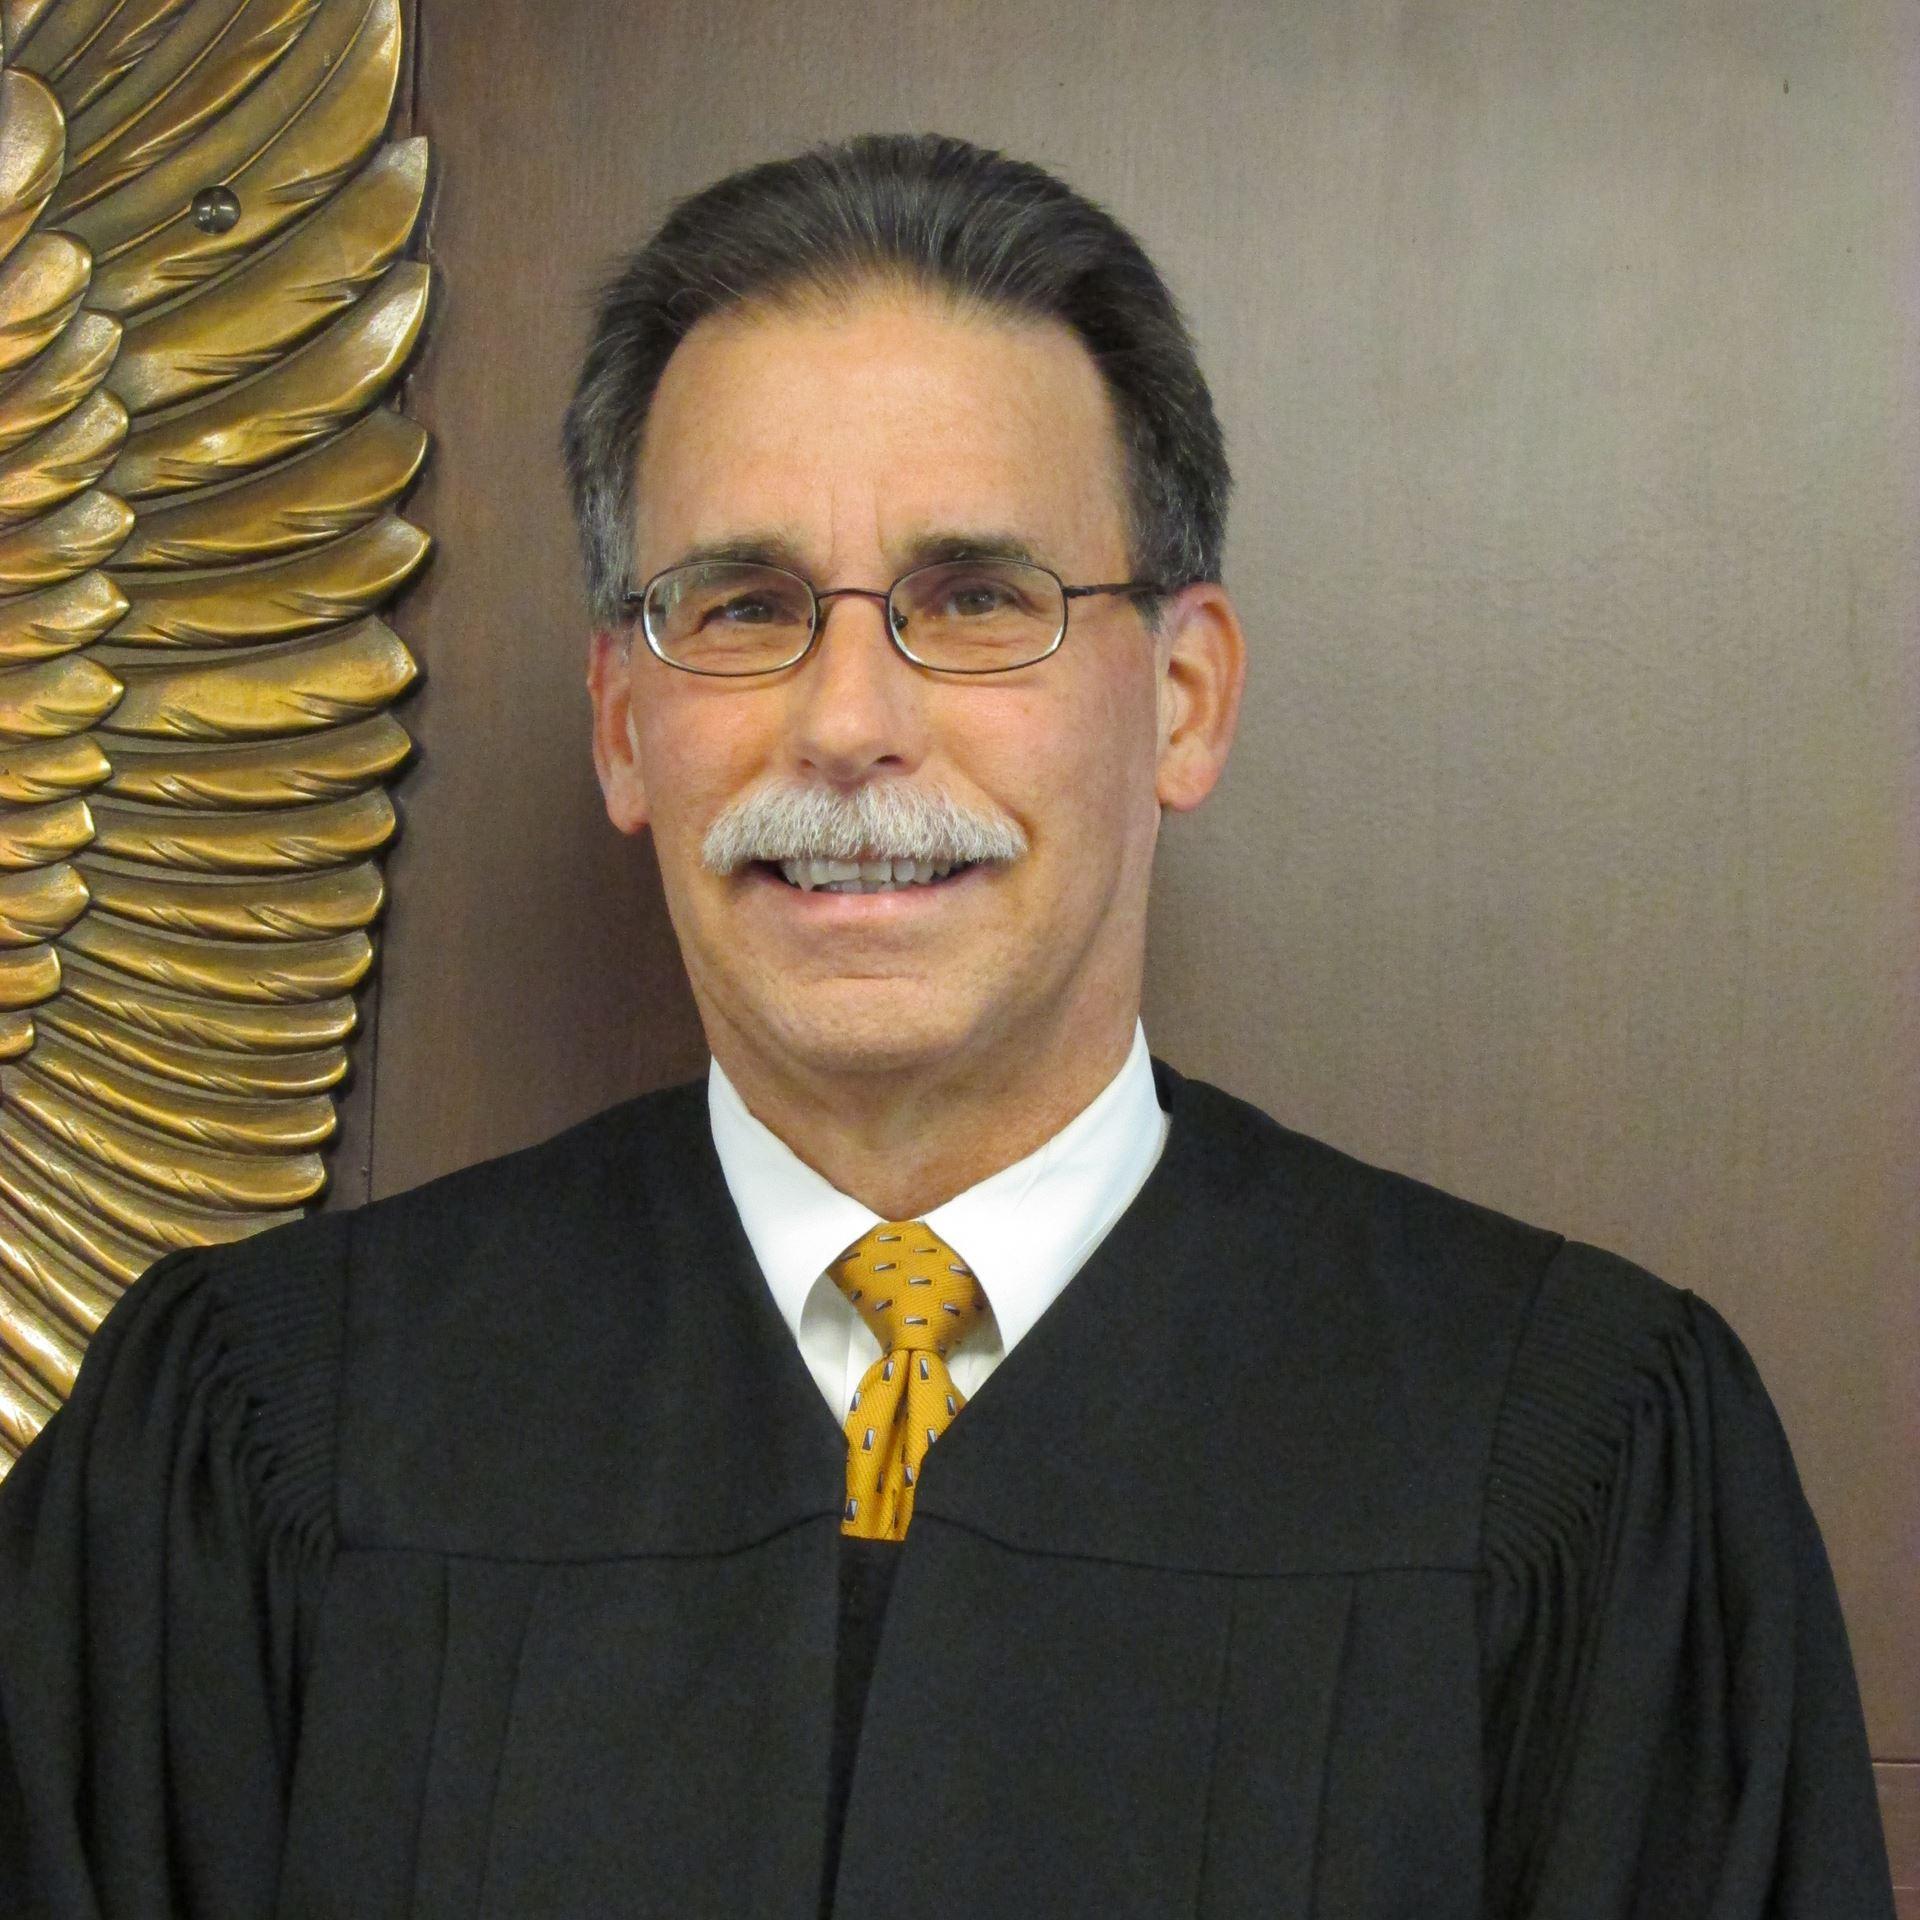 Craig Gargotta